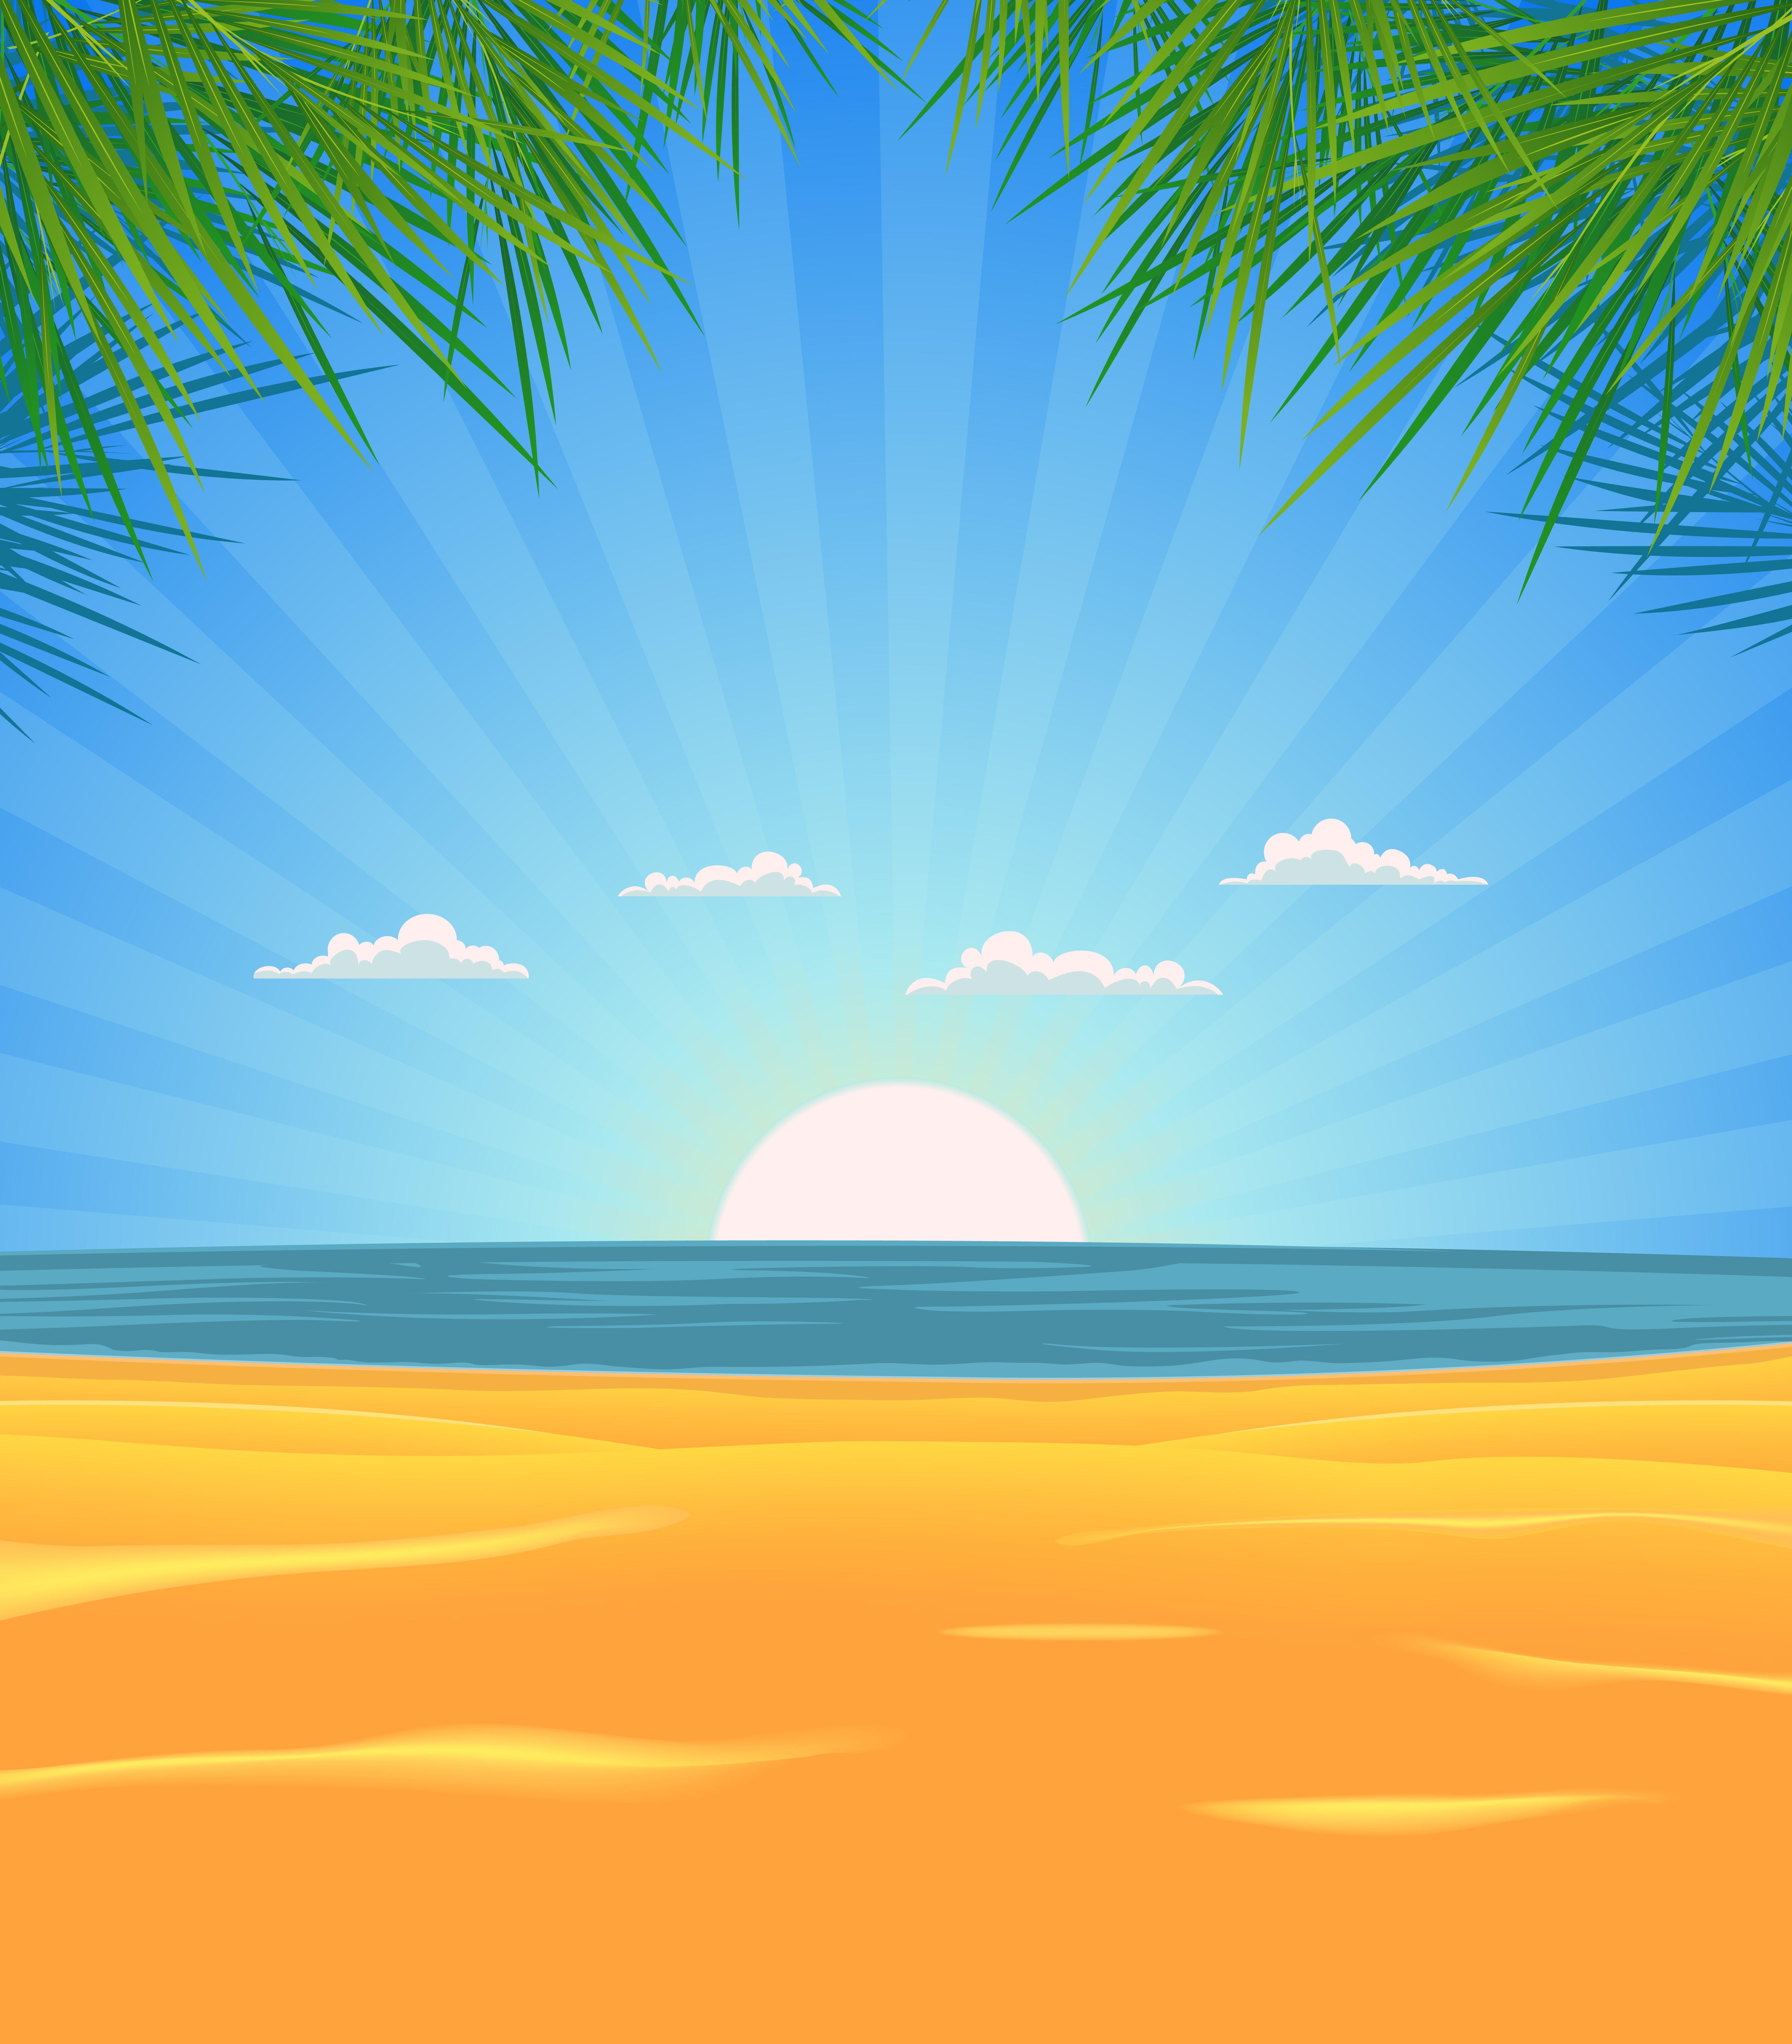 Summer Beach Landscape - Download Free Vectors, Clipart ...